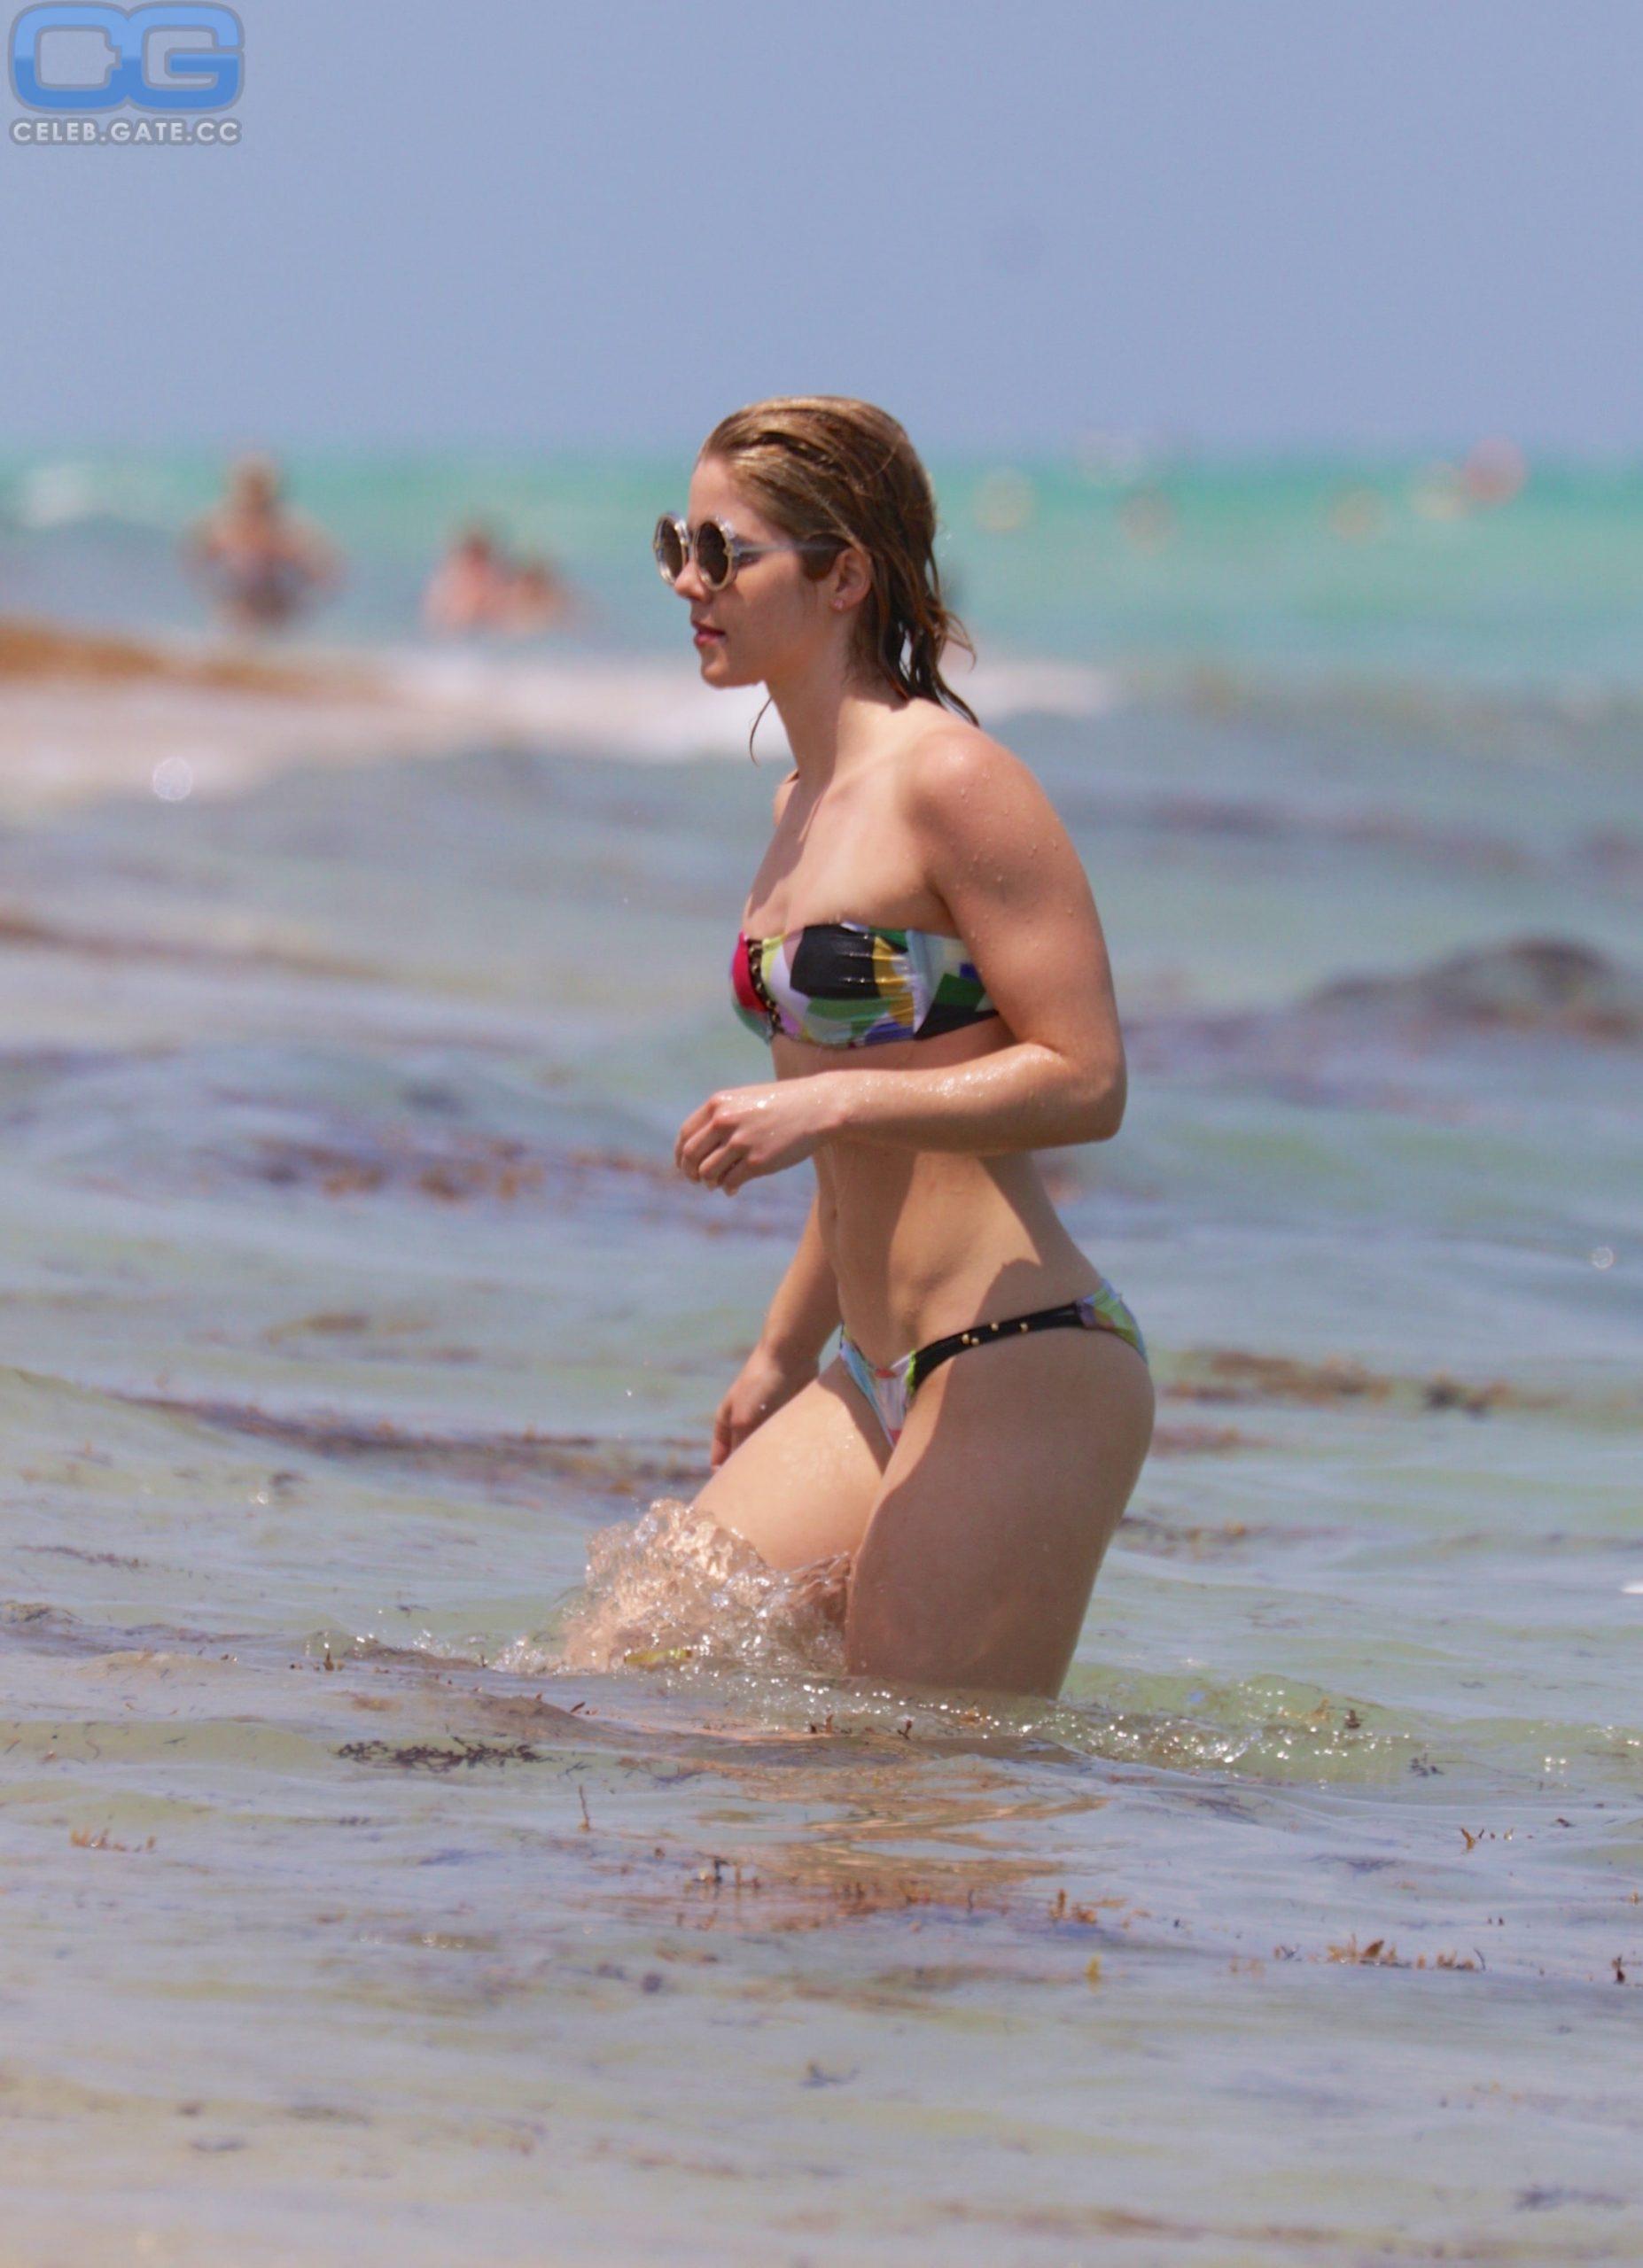 emily-bett-rickards-bikini-